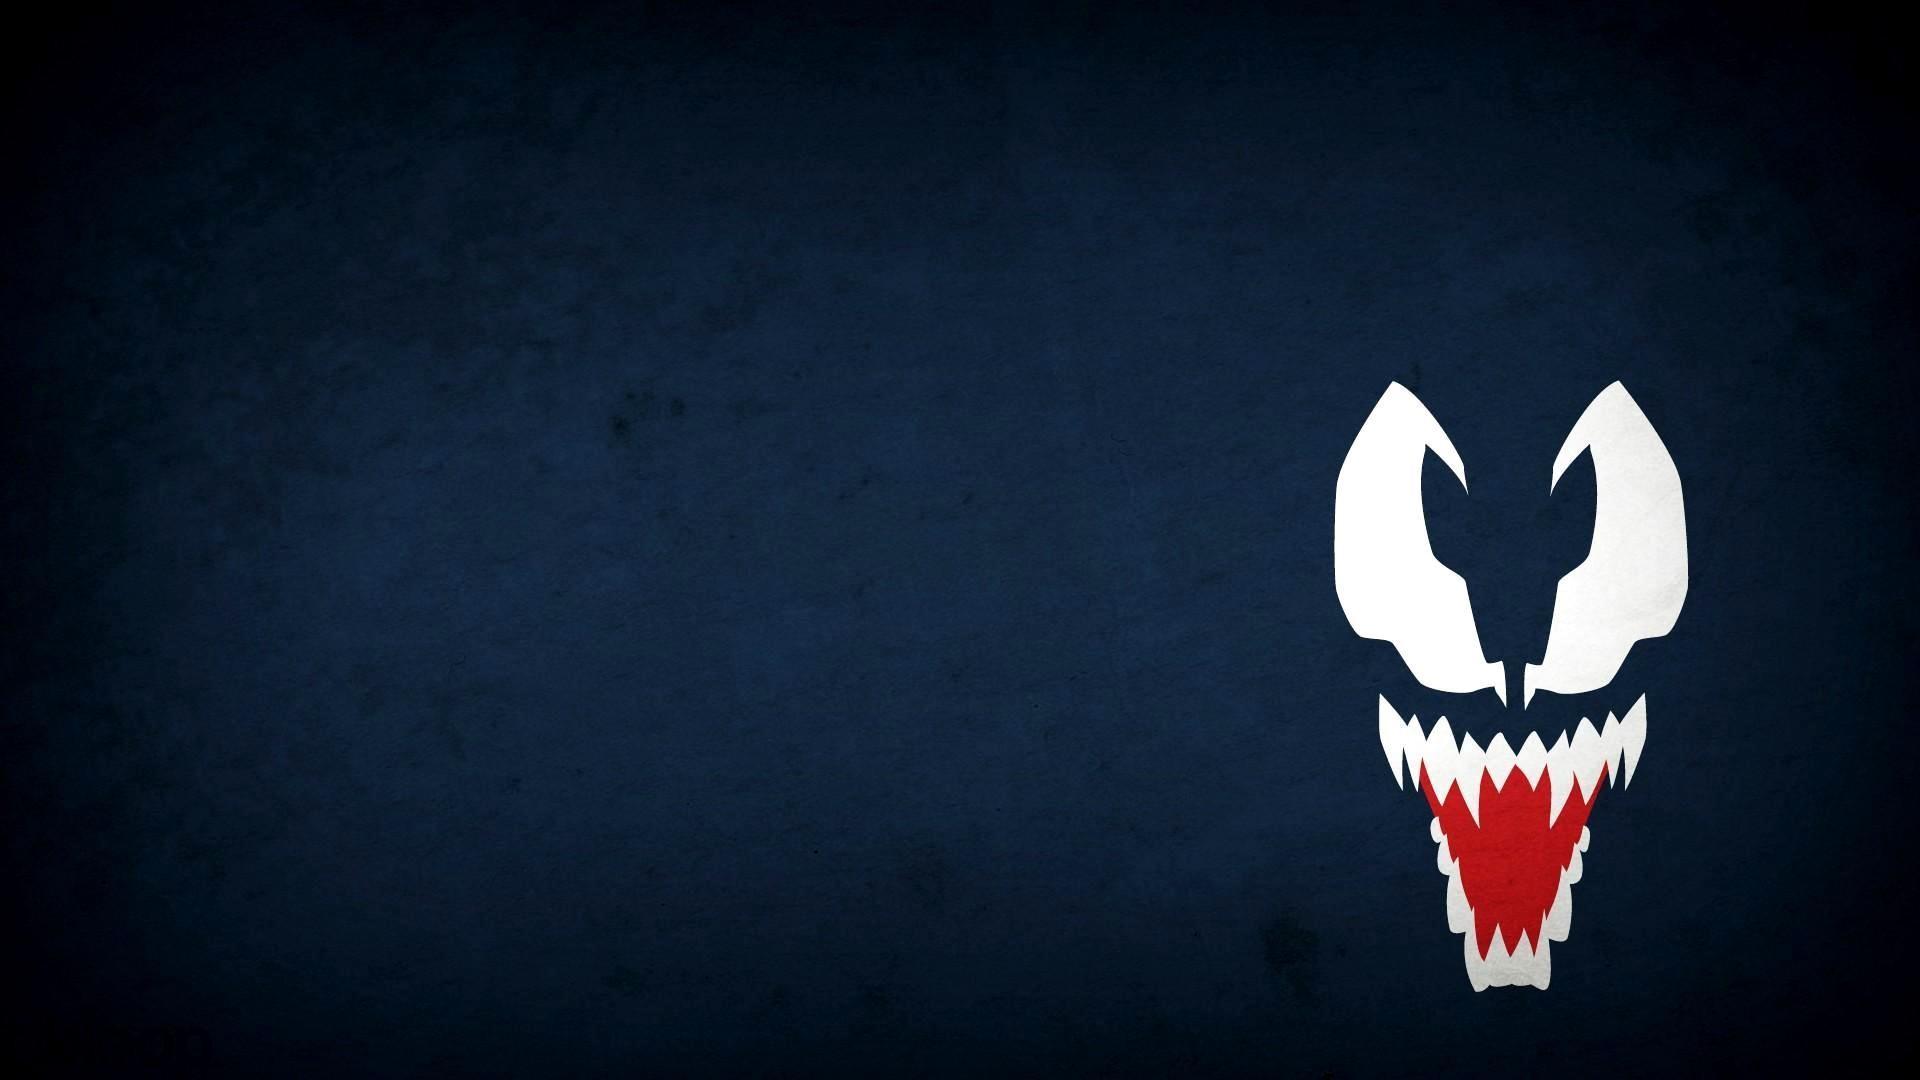 Animals For > Spiderman Venom Logo Wallpaper